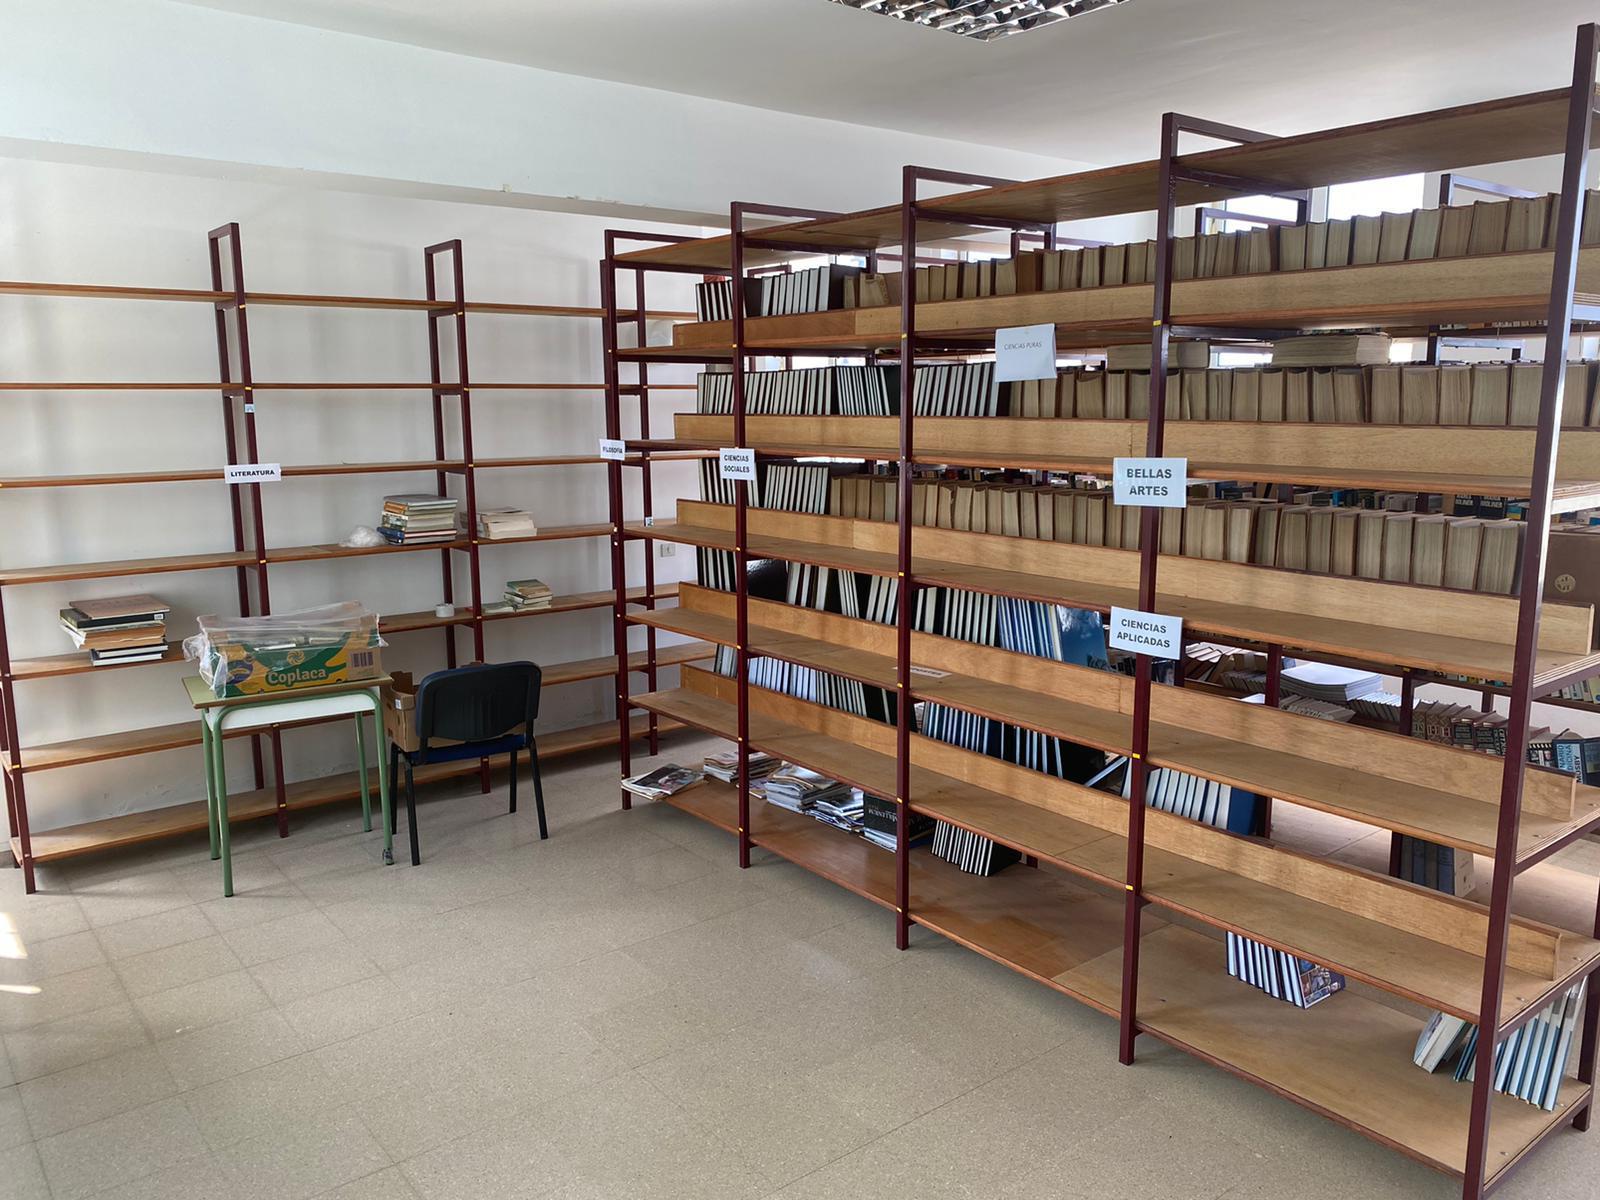 Biblioteca Municipal Fuencaliente